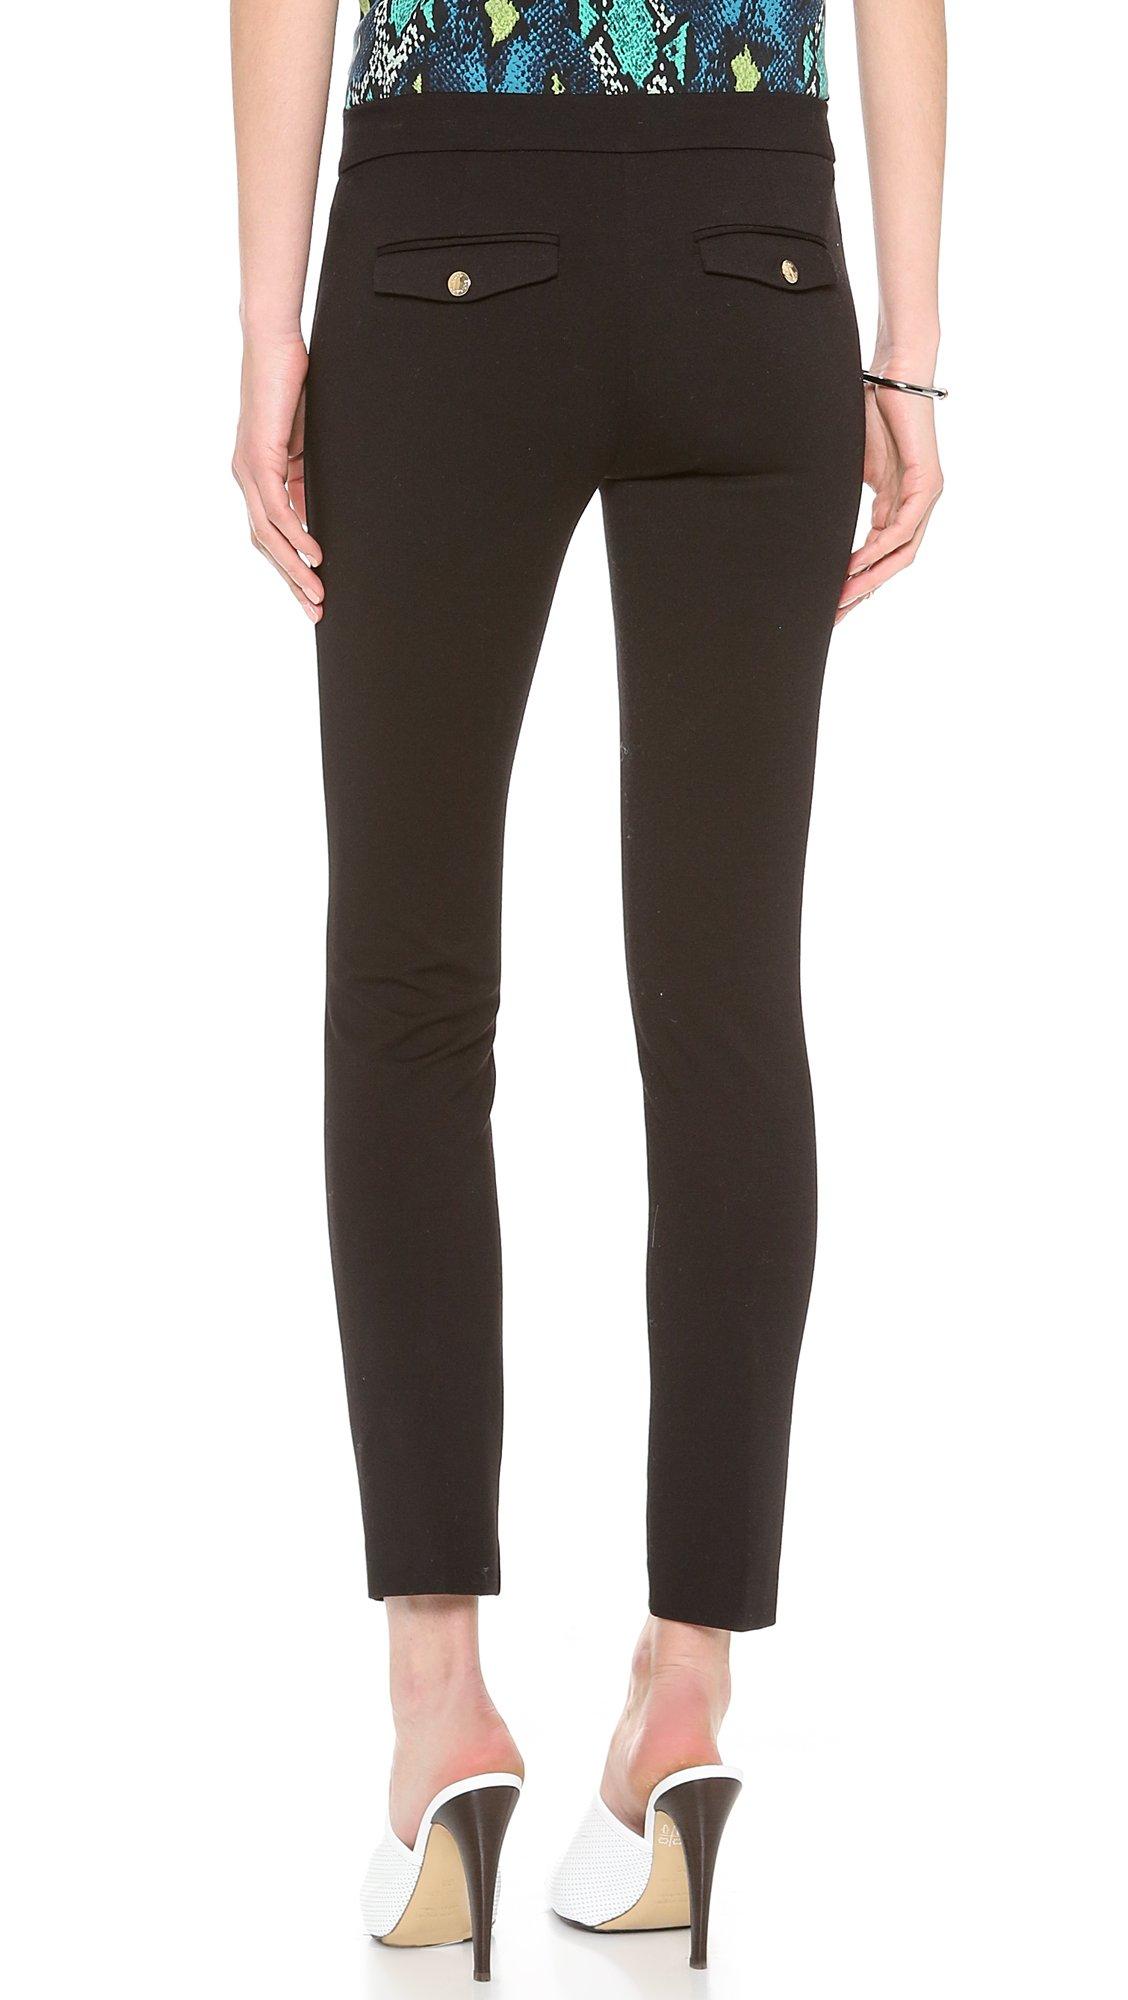 juicy couture ponte crop pants in black lyst. Black Bedroom Furniture Sets. Home Design Ideas